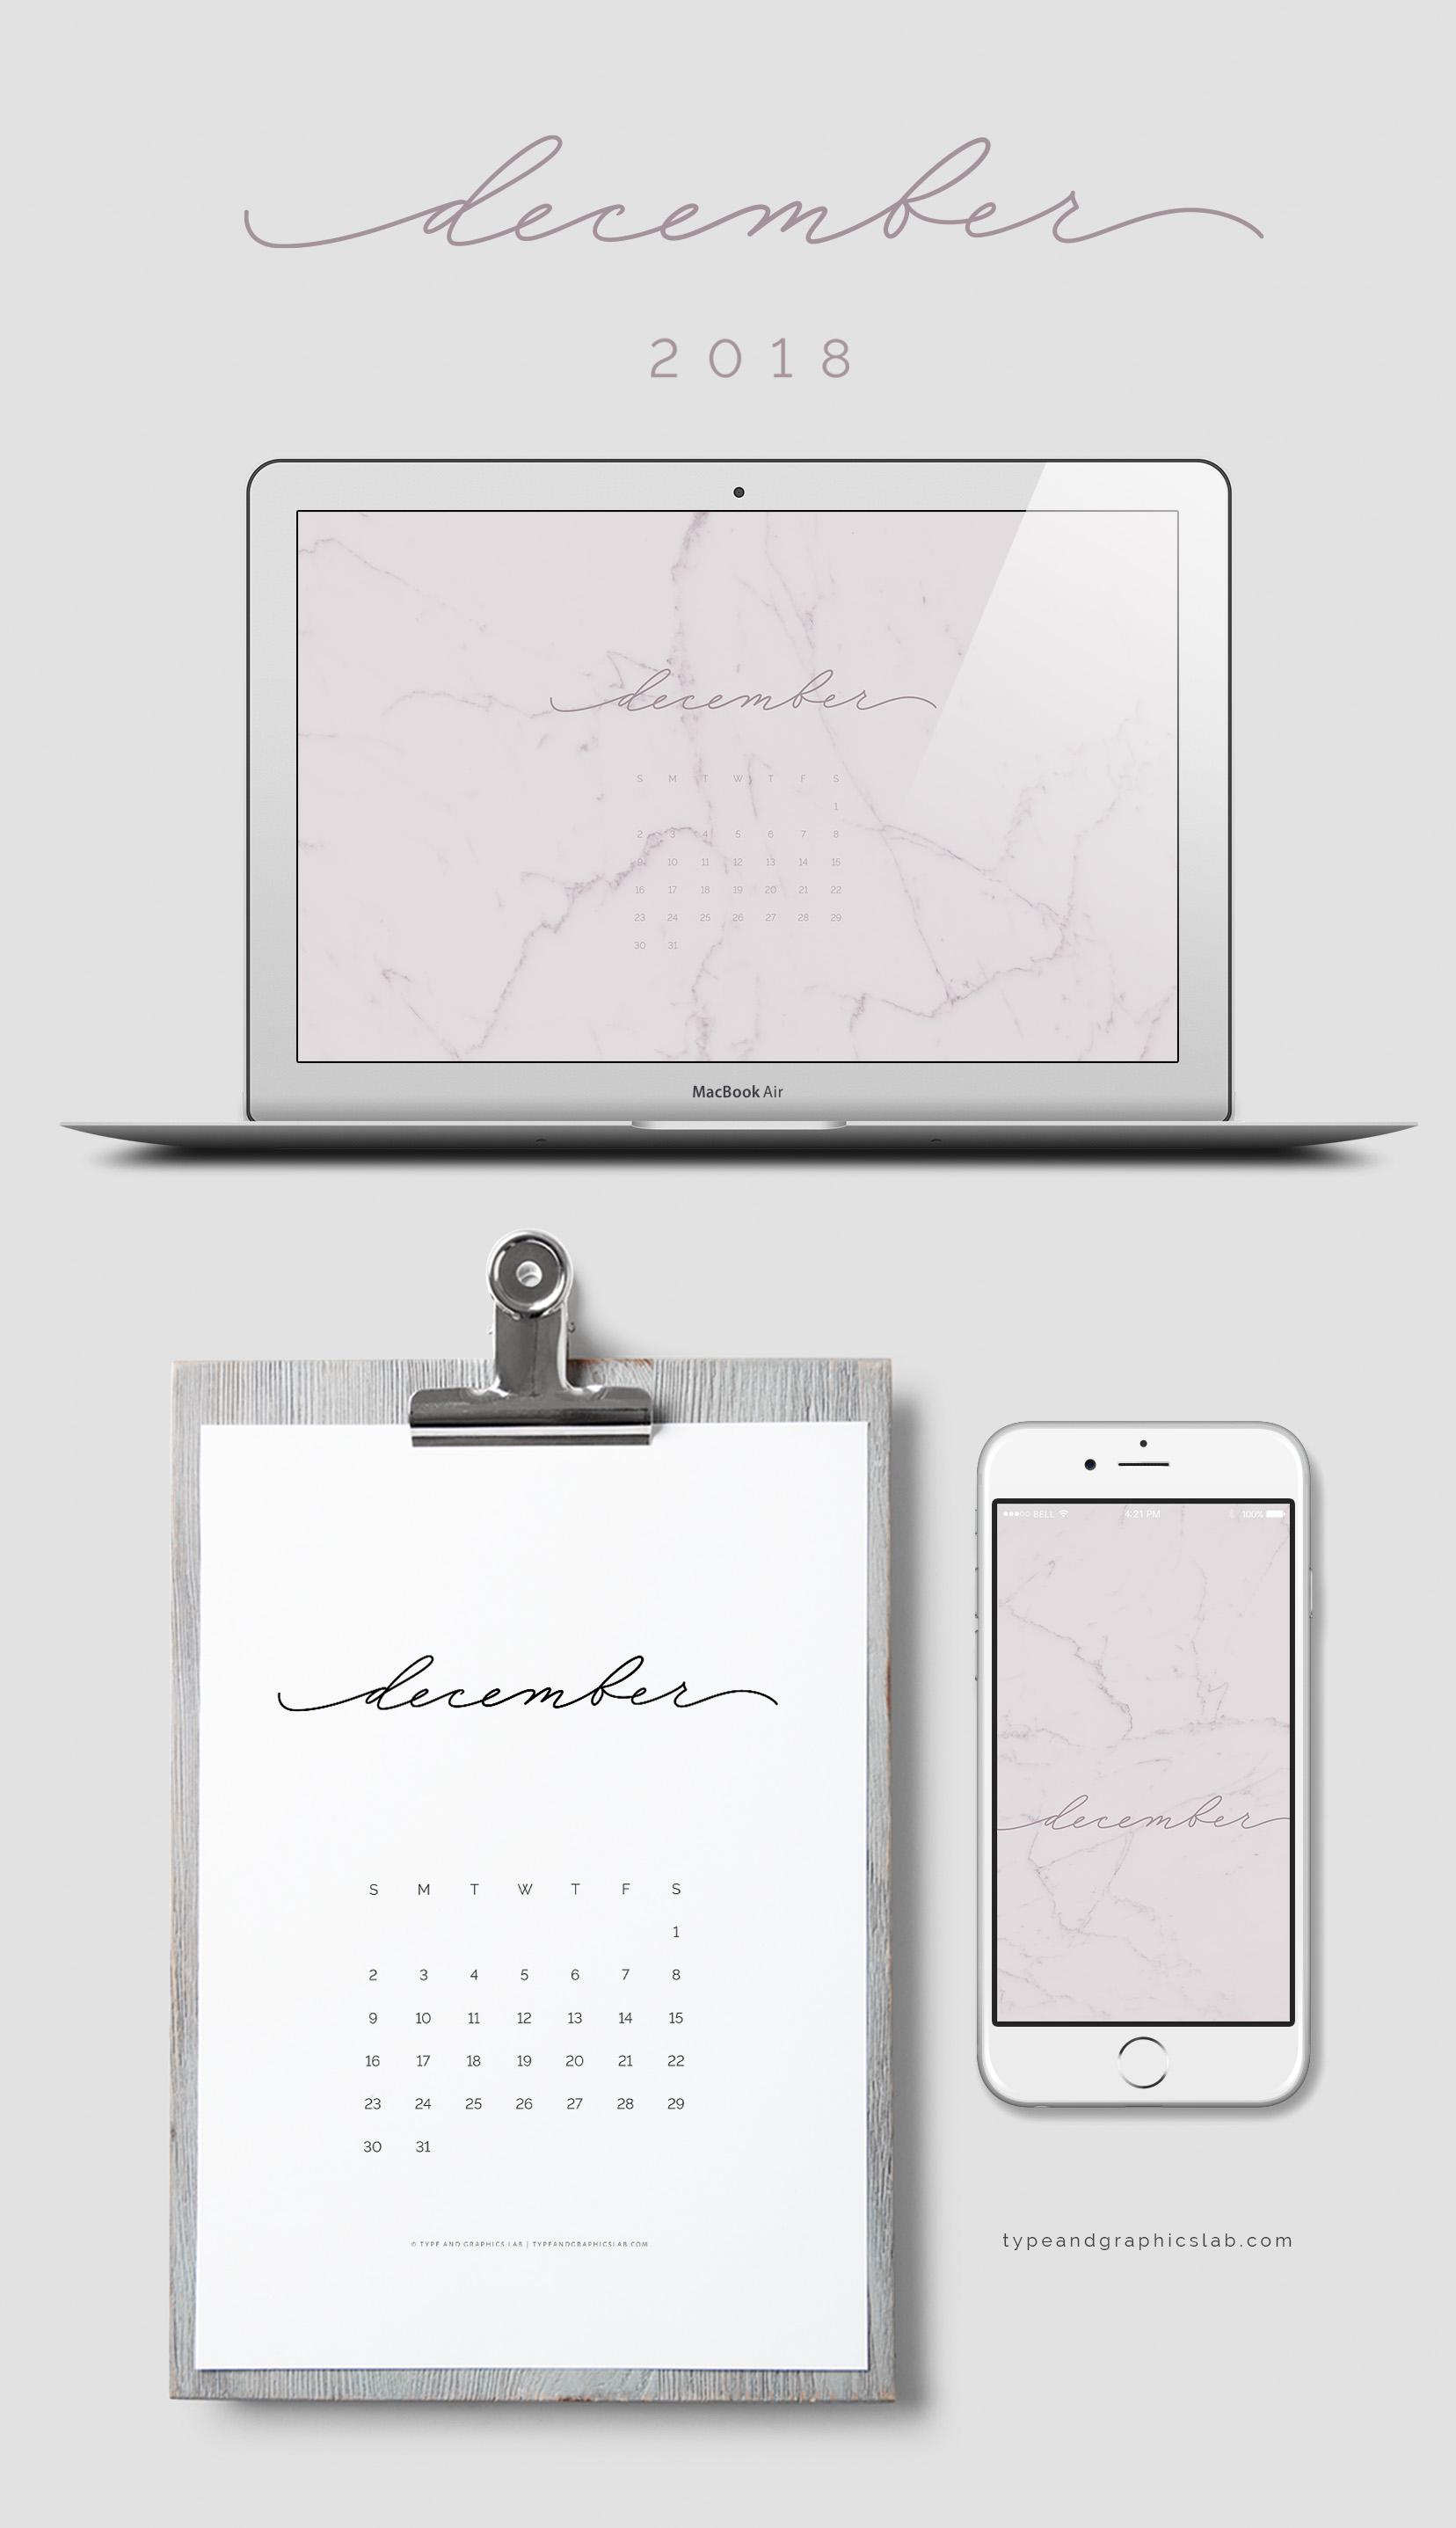 Download free desktop, mobile, and printable calendar for December 2018 |©typeandgraphicslab.com | For personal use only